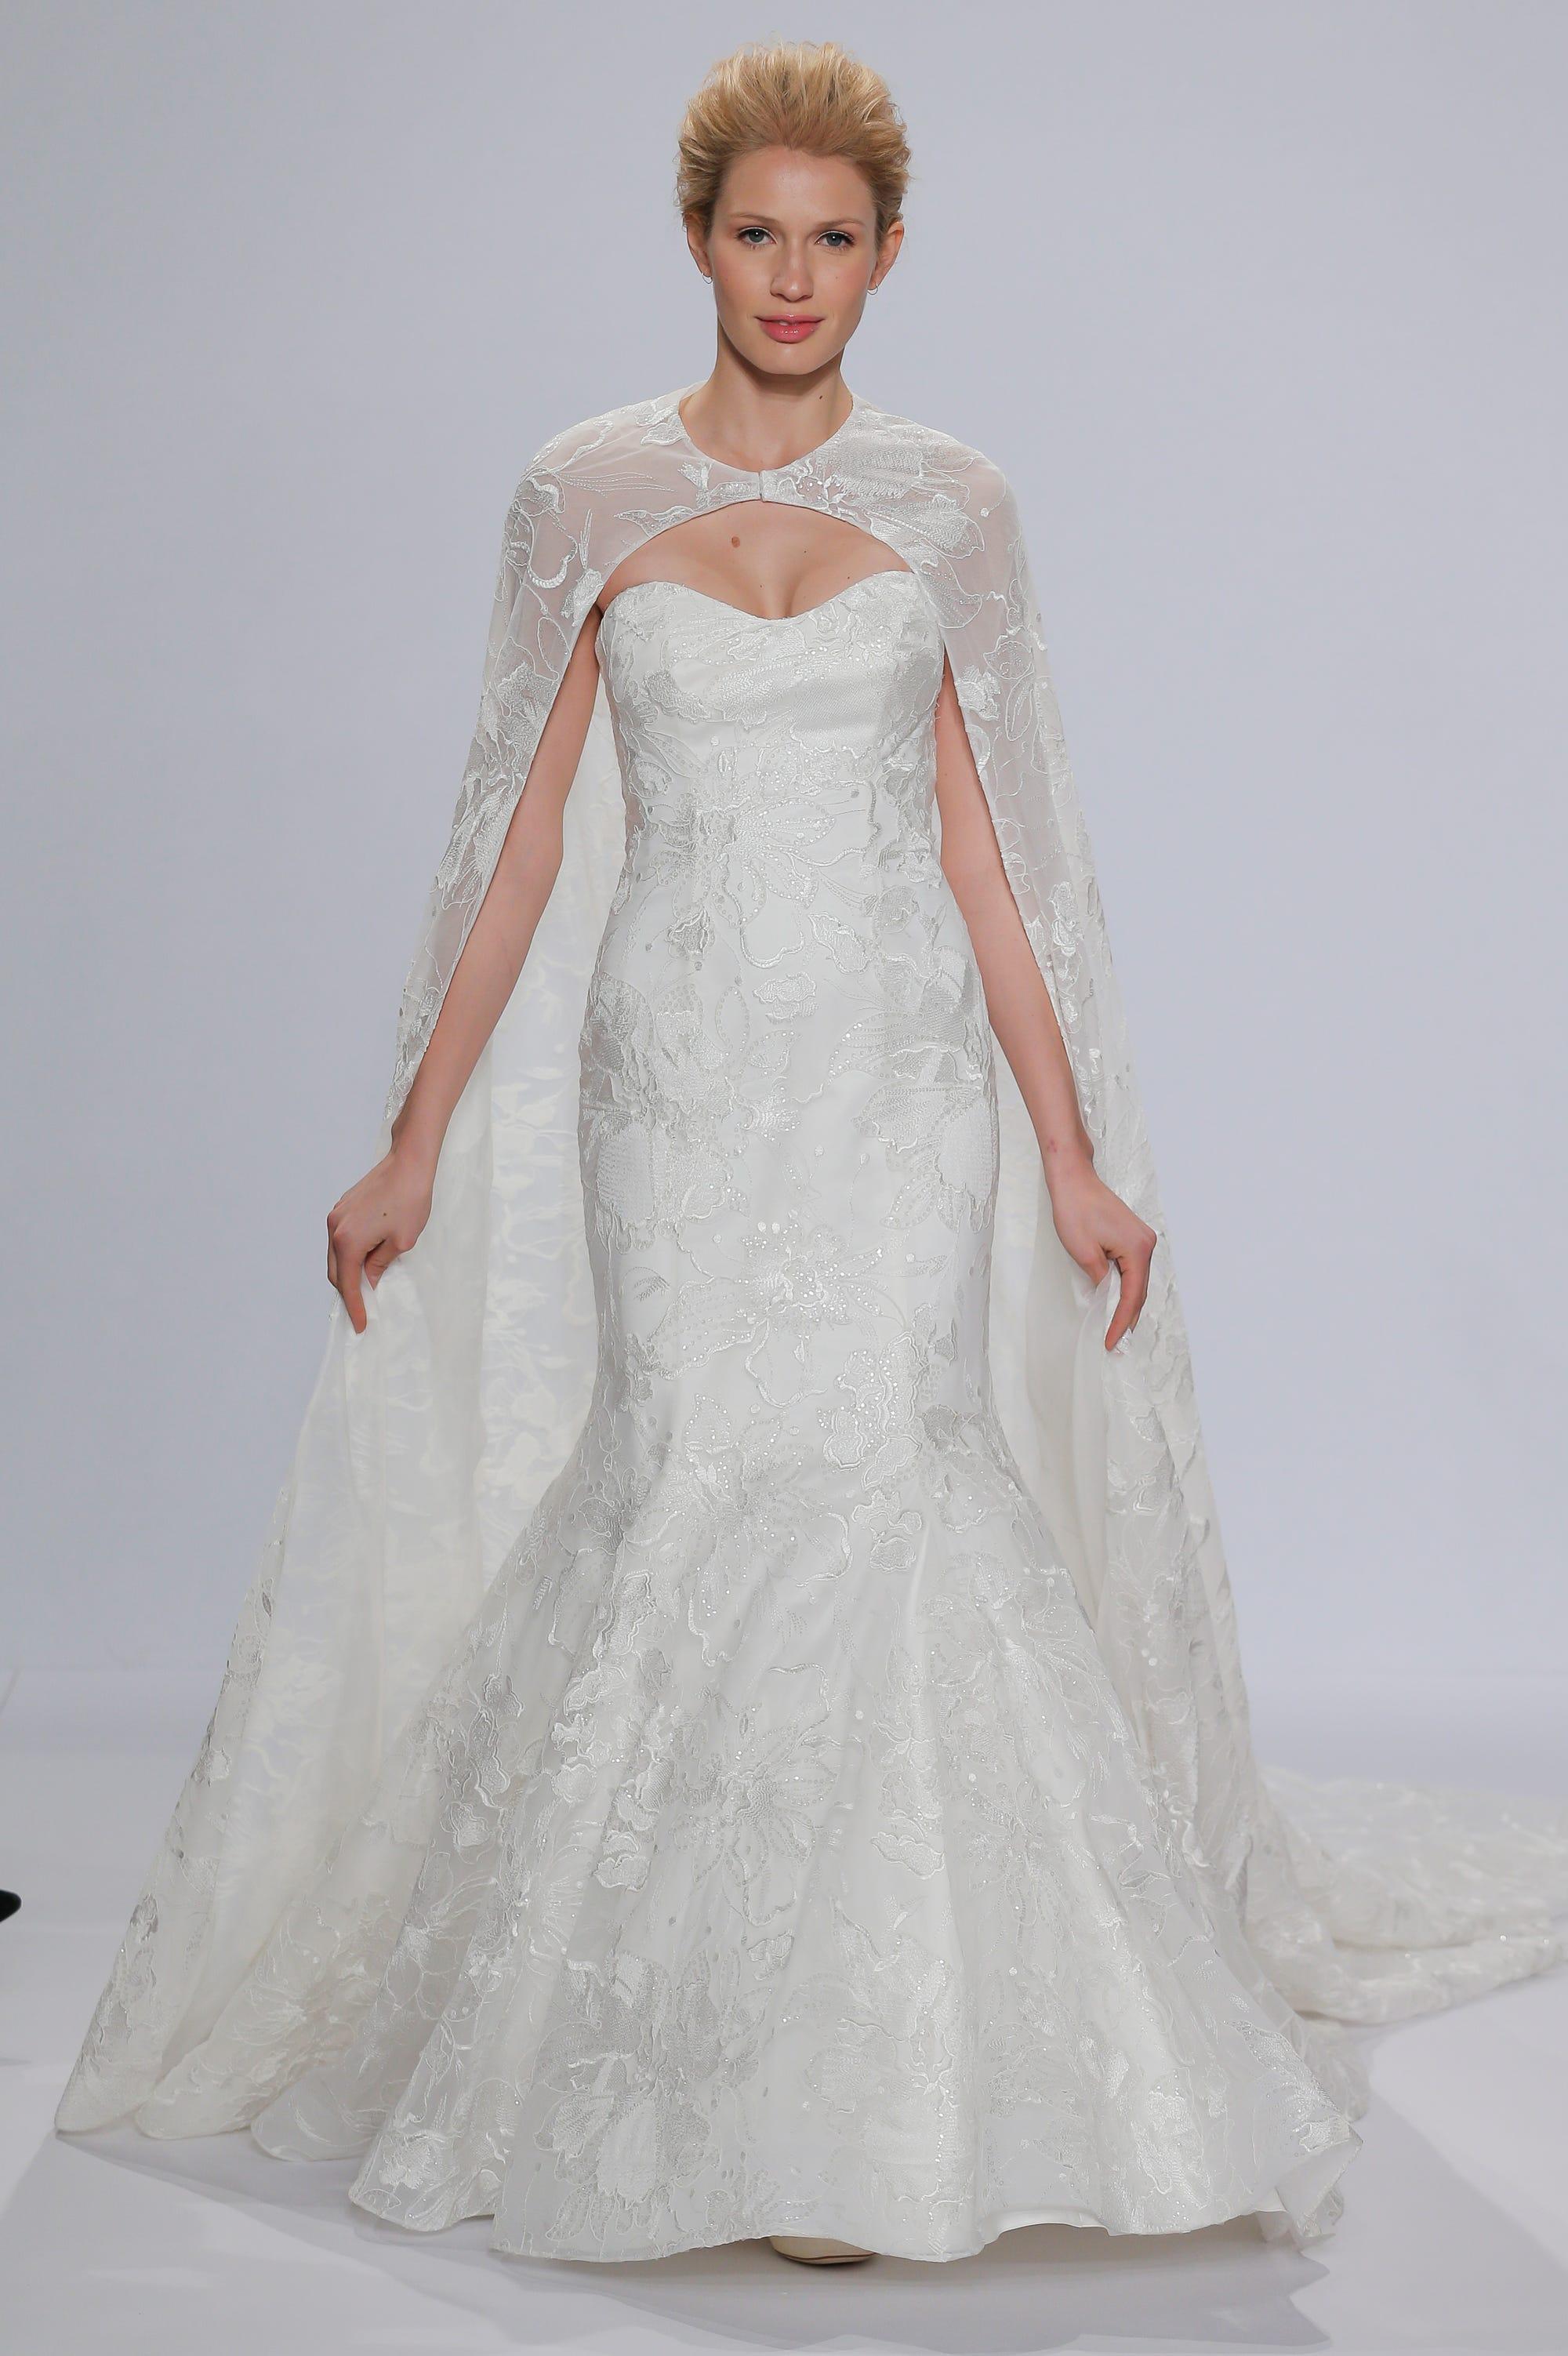 Say Yes To The Dress Randy Fenoli Debuts Bridal Line